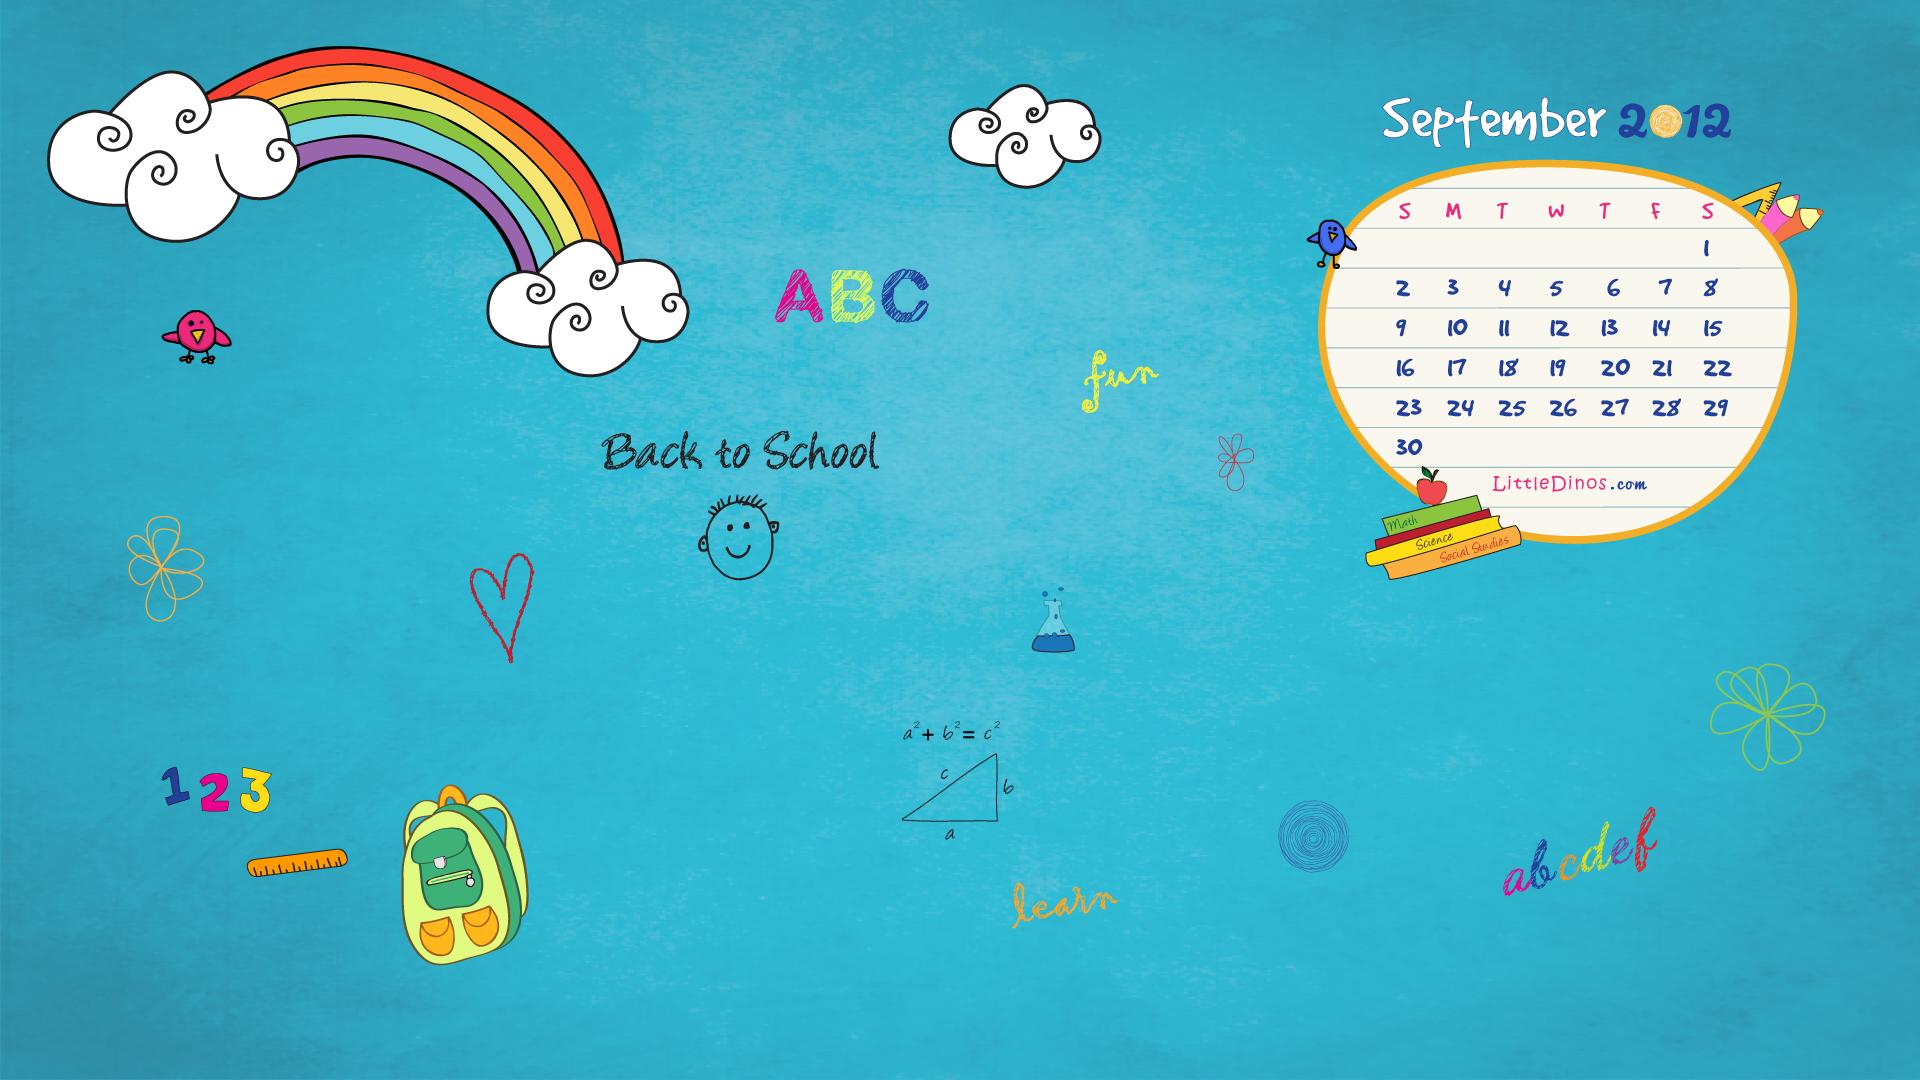 Blog September 2012 Back to School Calendar Wallpaper Little Dinos 1920x1080